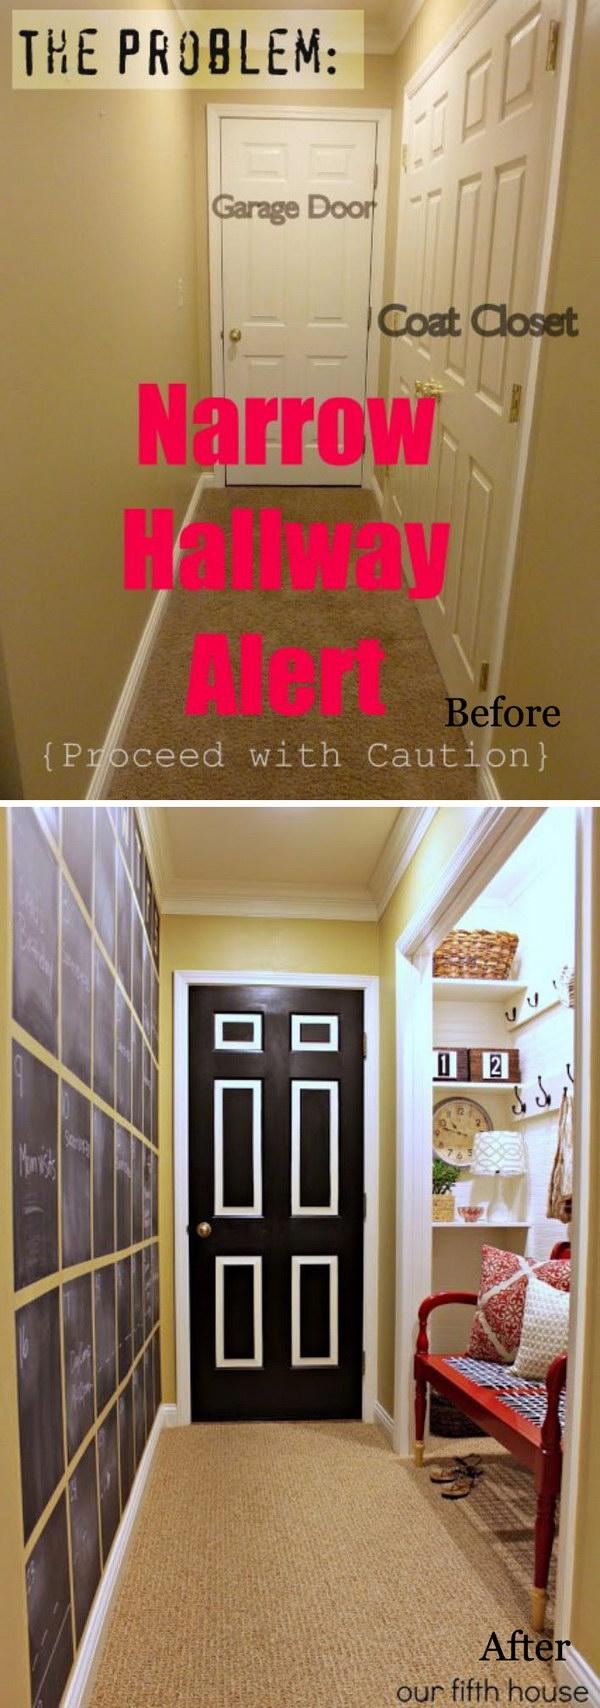 12 entryway makeover diy ideas tutorials - 30+ DIY Ideas to Give a Makeover to a Your Entryway